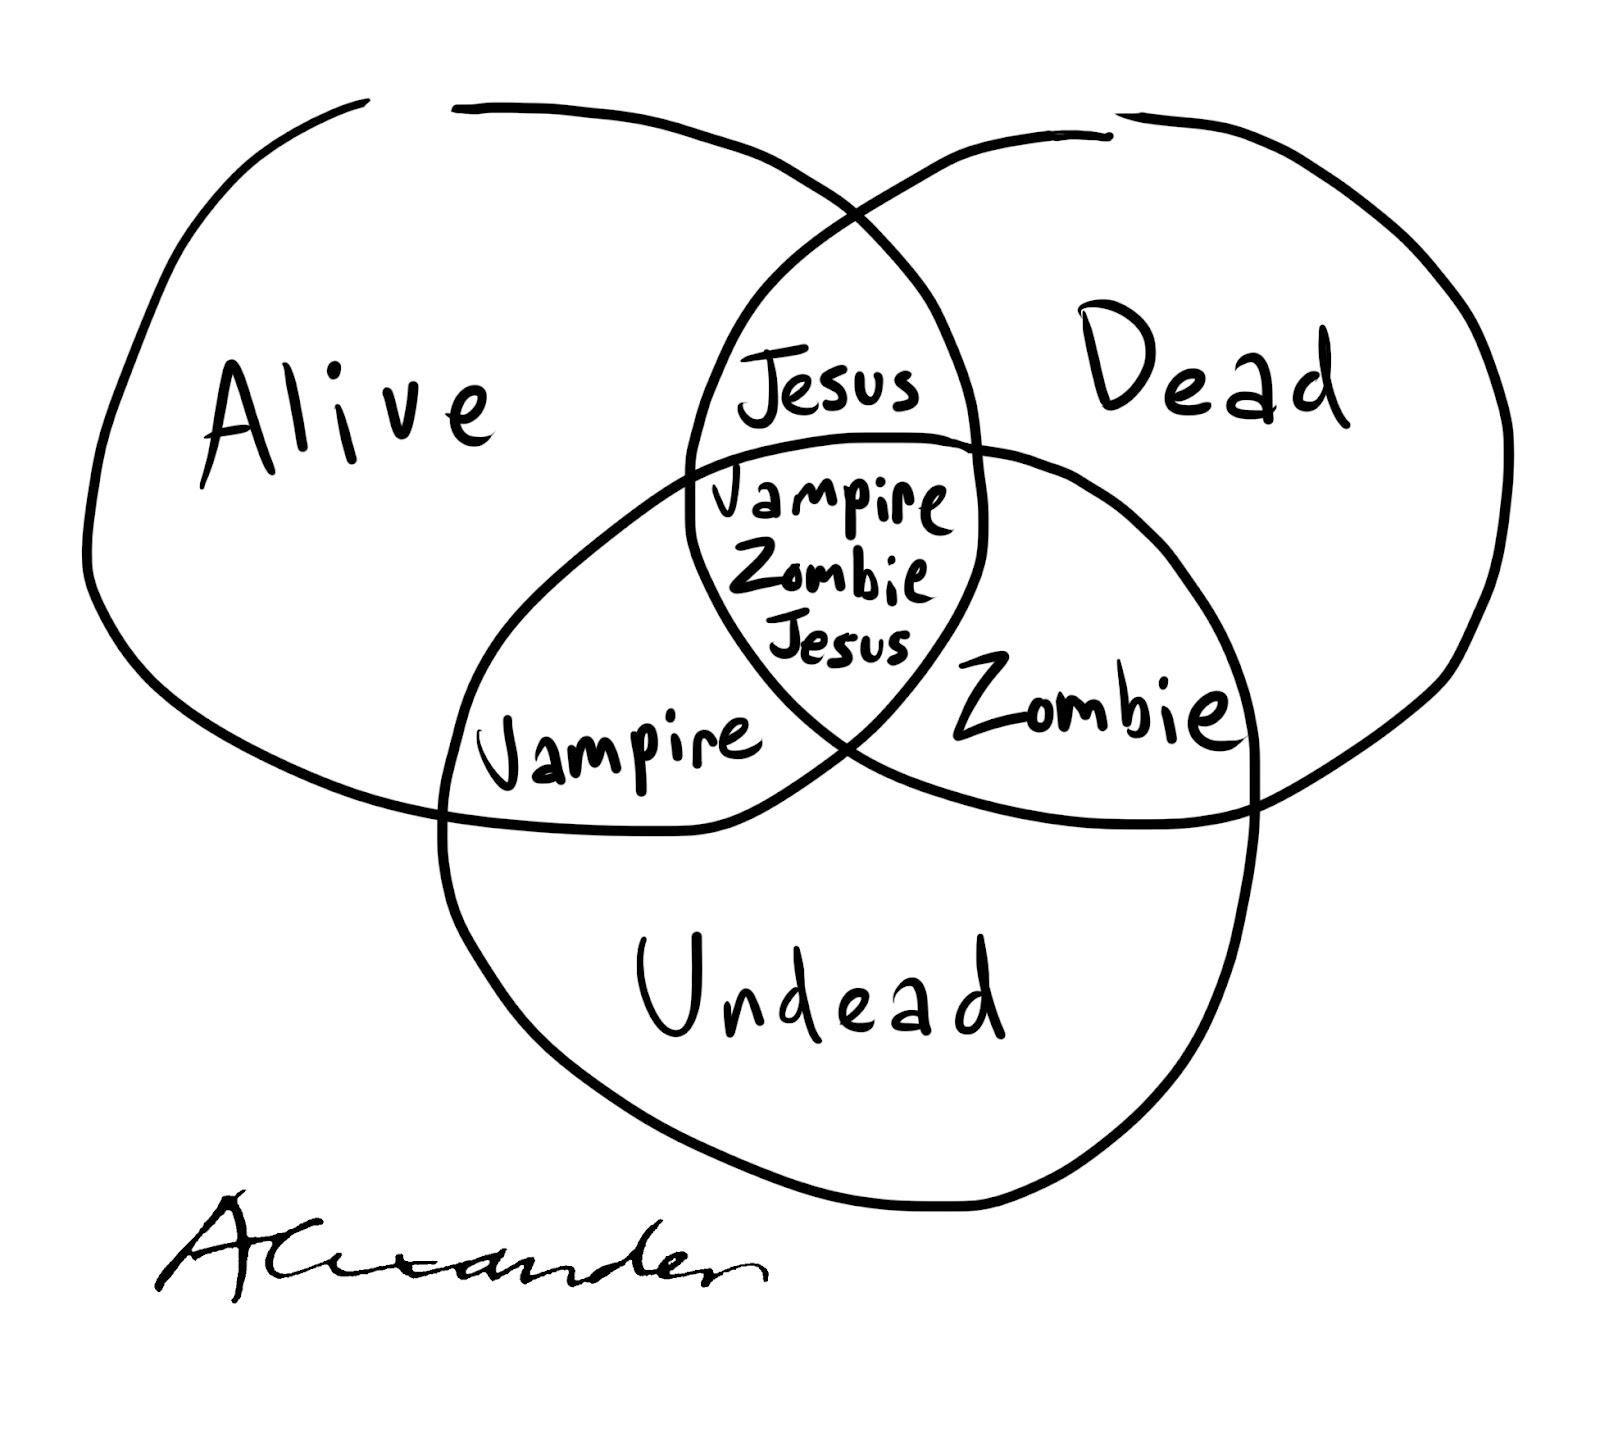 Alexander S Cartoon Blog Venn Diagram